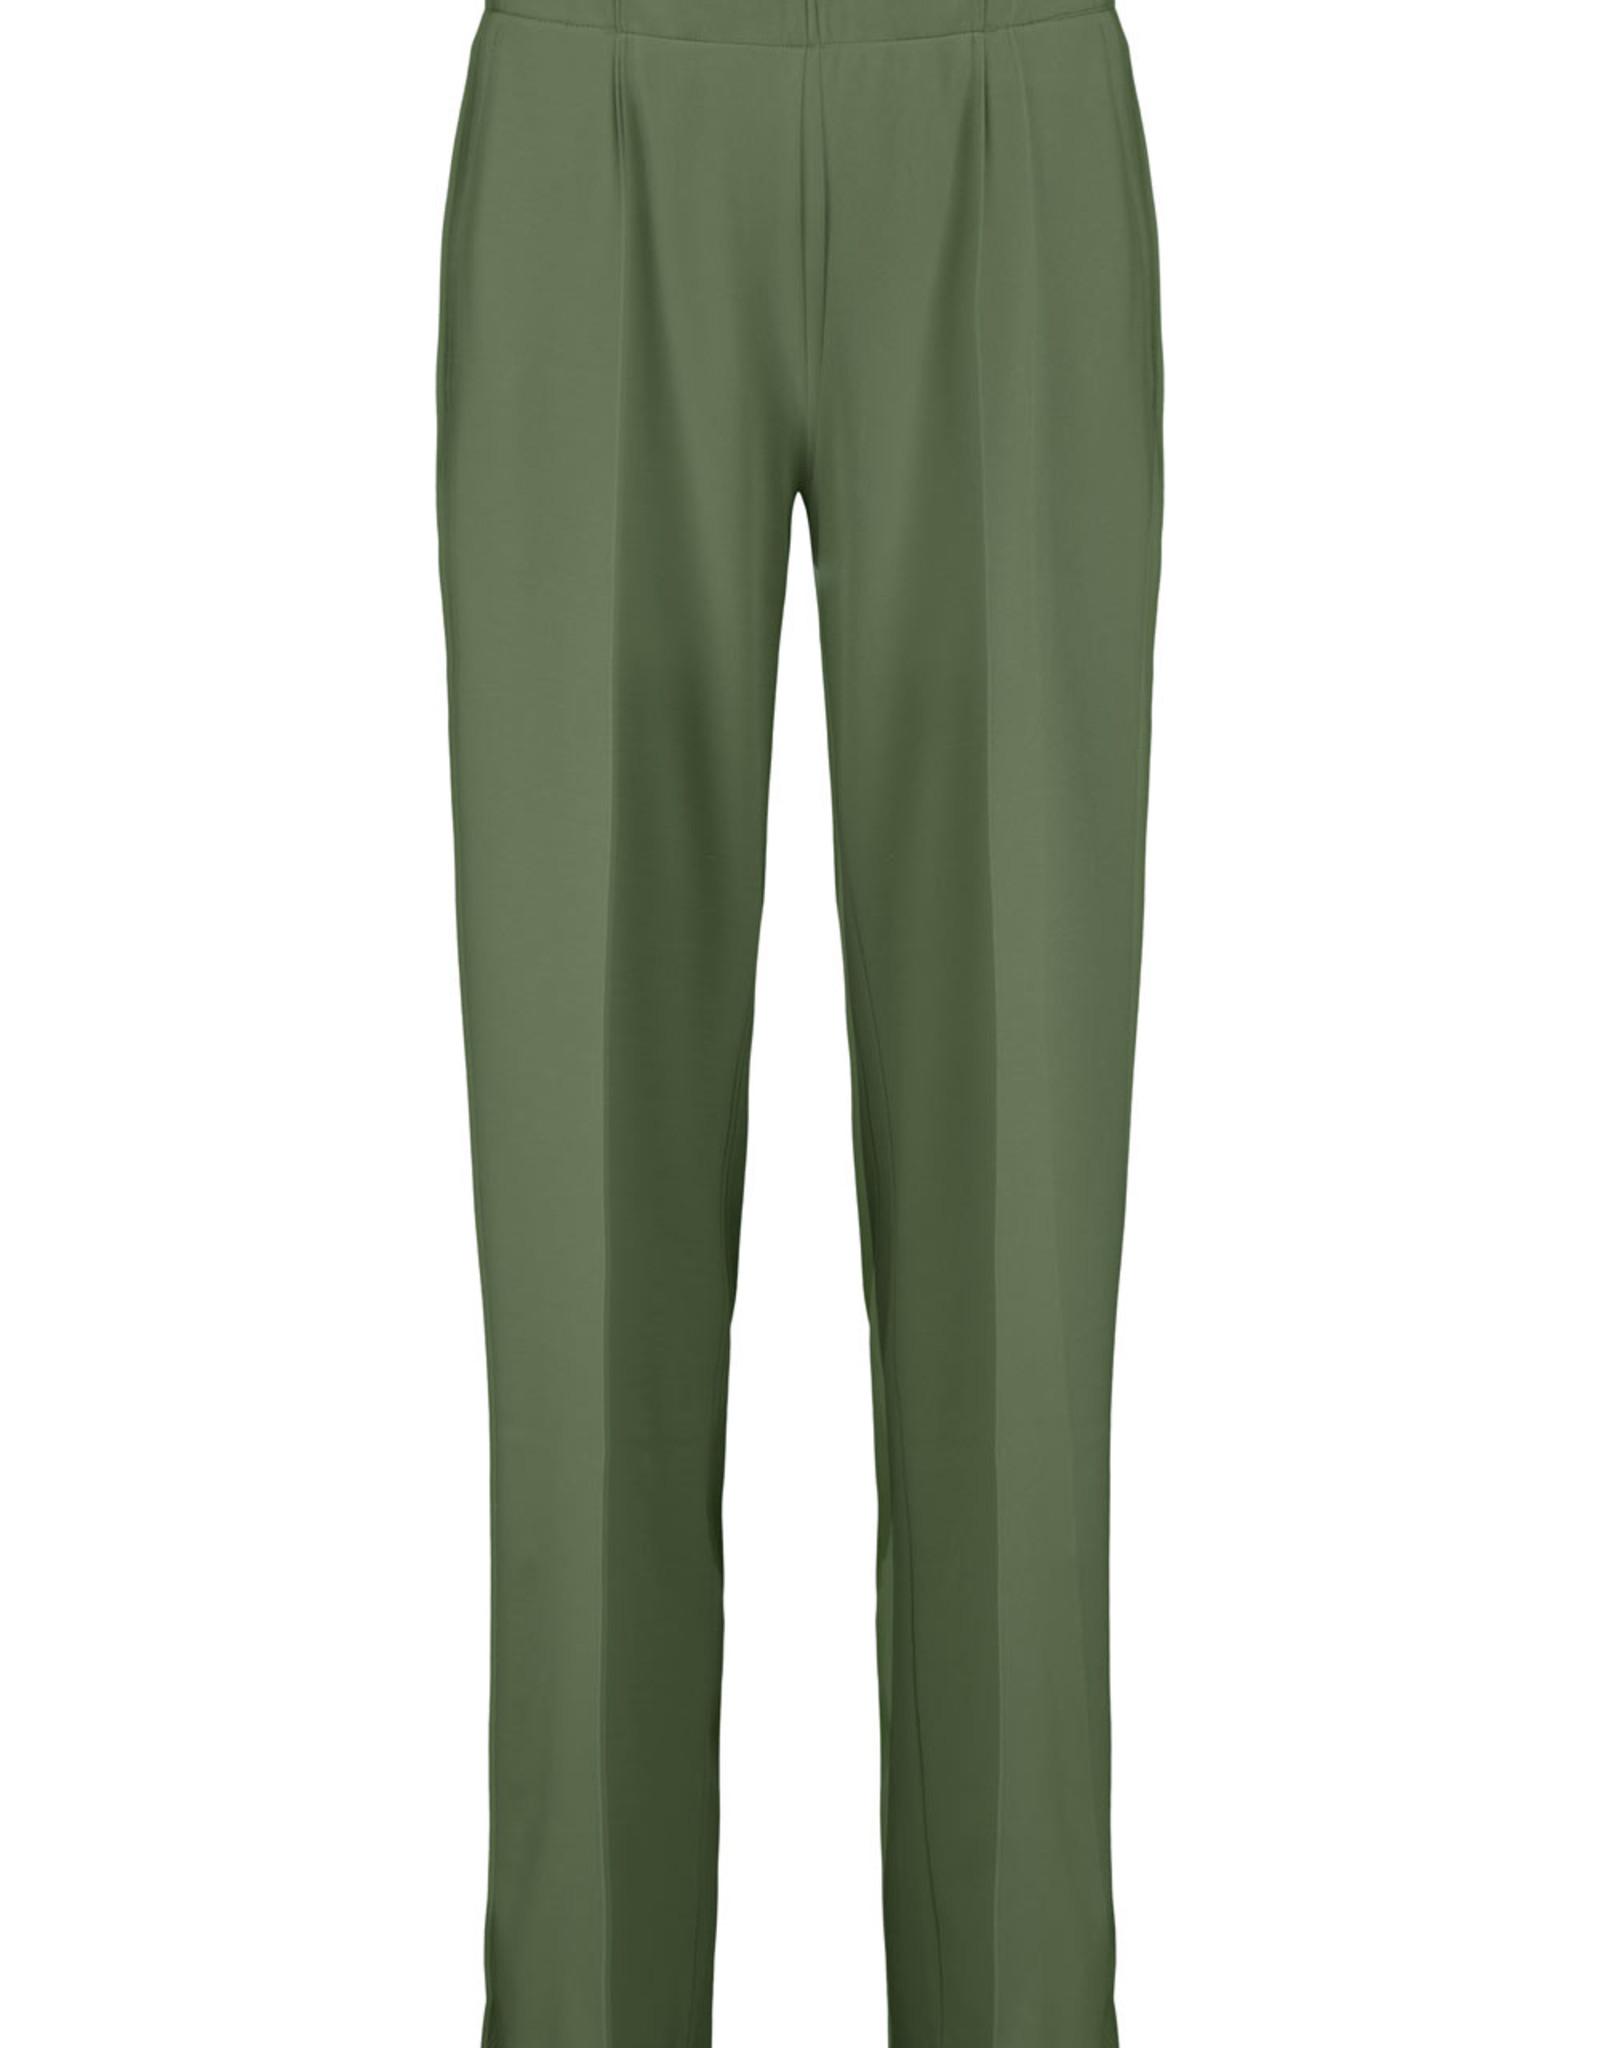 Modstrom Gene Fashion Pants Sea Green